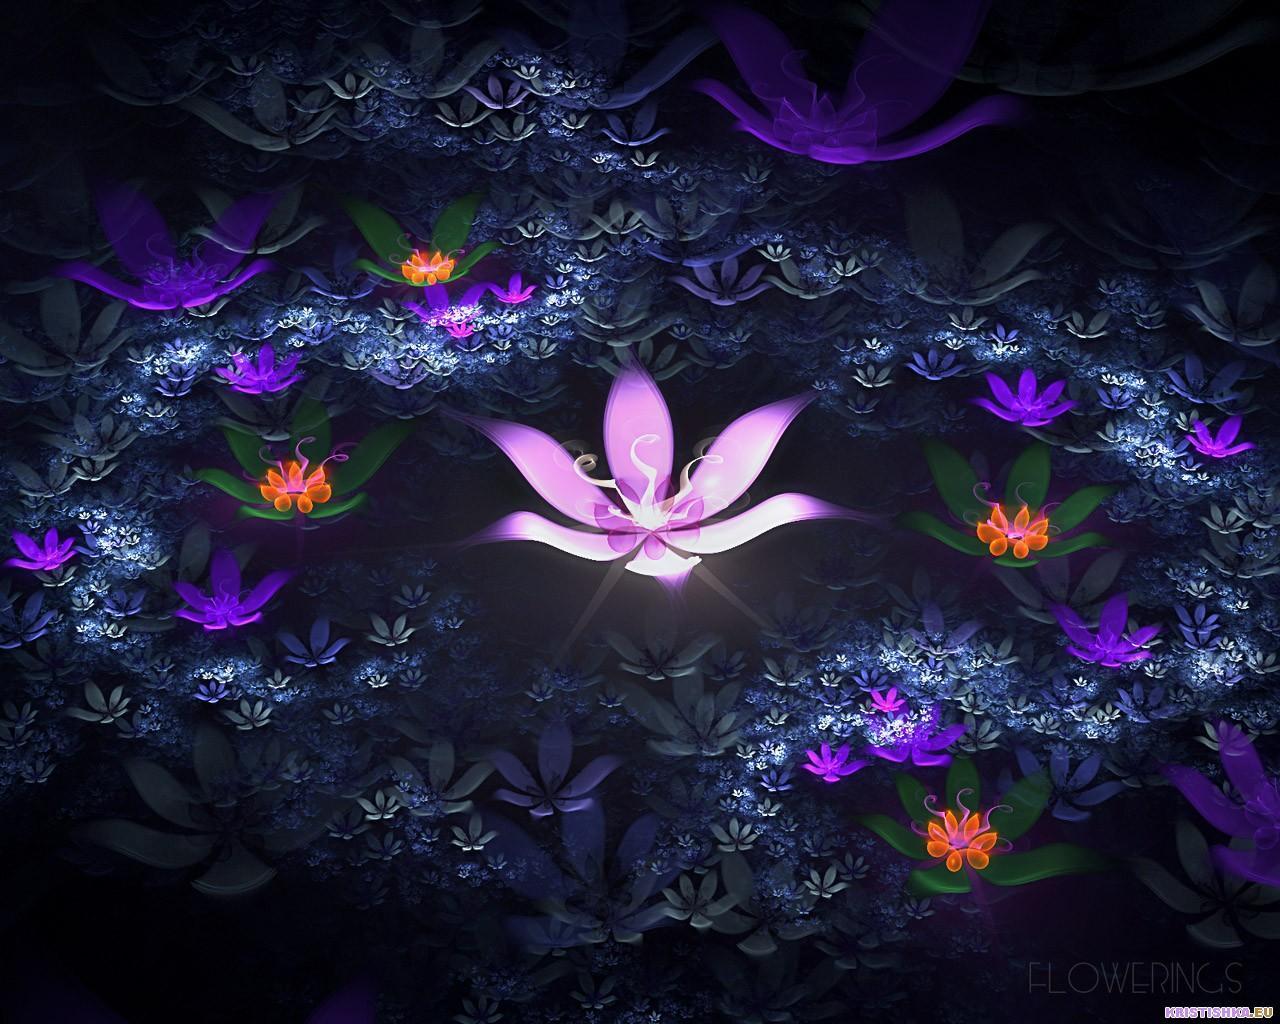 Fractal 3D Flowers 14 World Wallpaper Collection